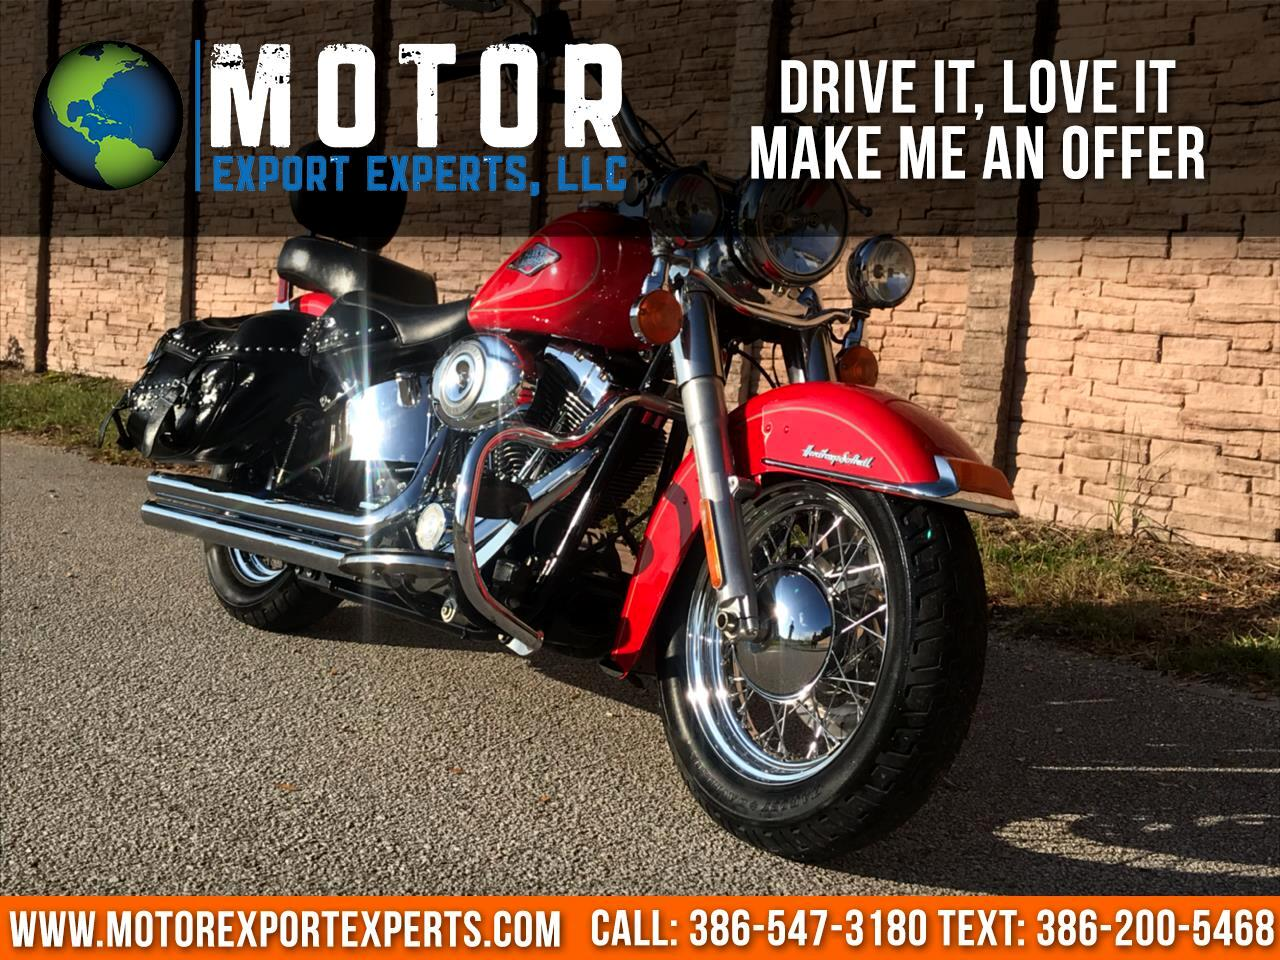 2010 Harley-Davidson FLSTC HERITAGE CLASSIC